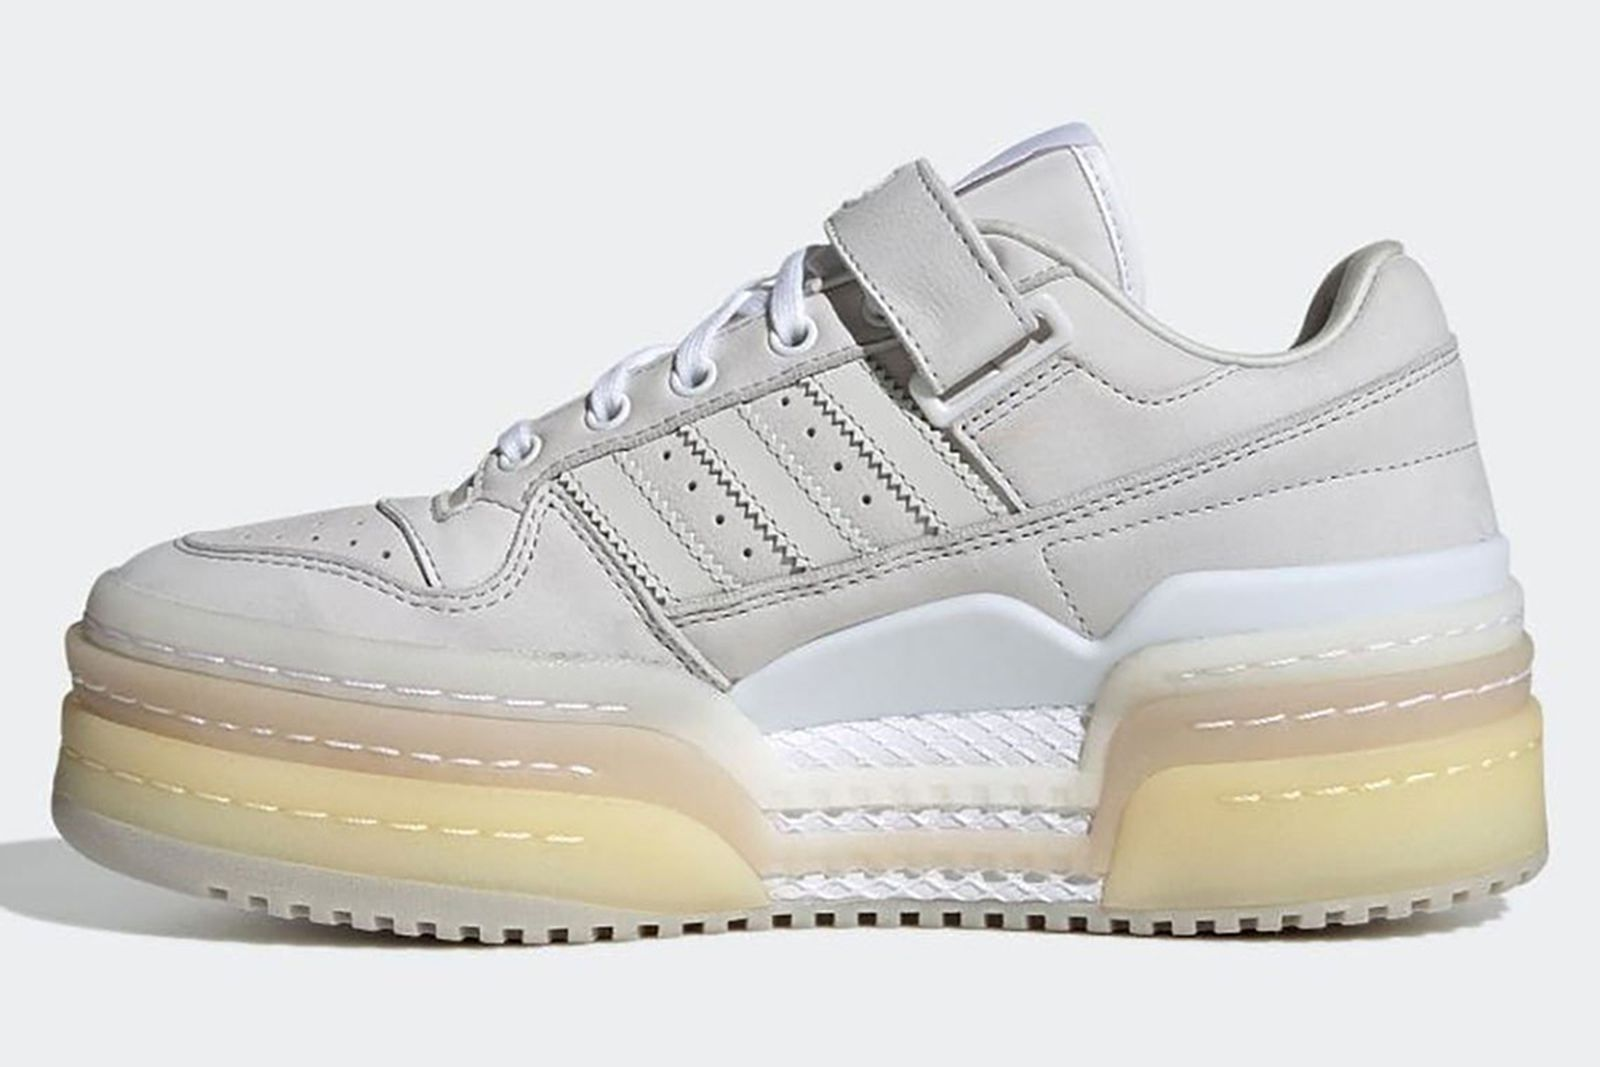 adidas-triple-platforum-lo-crystal-white-release-date-price-01